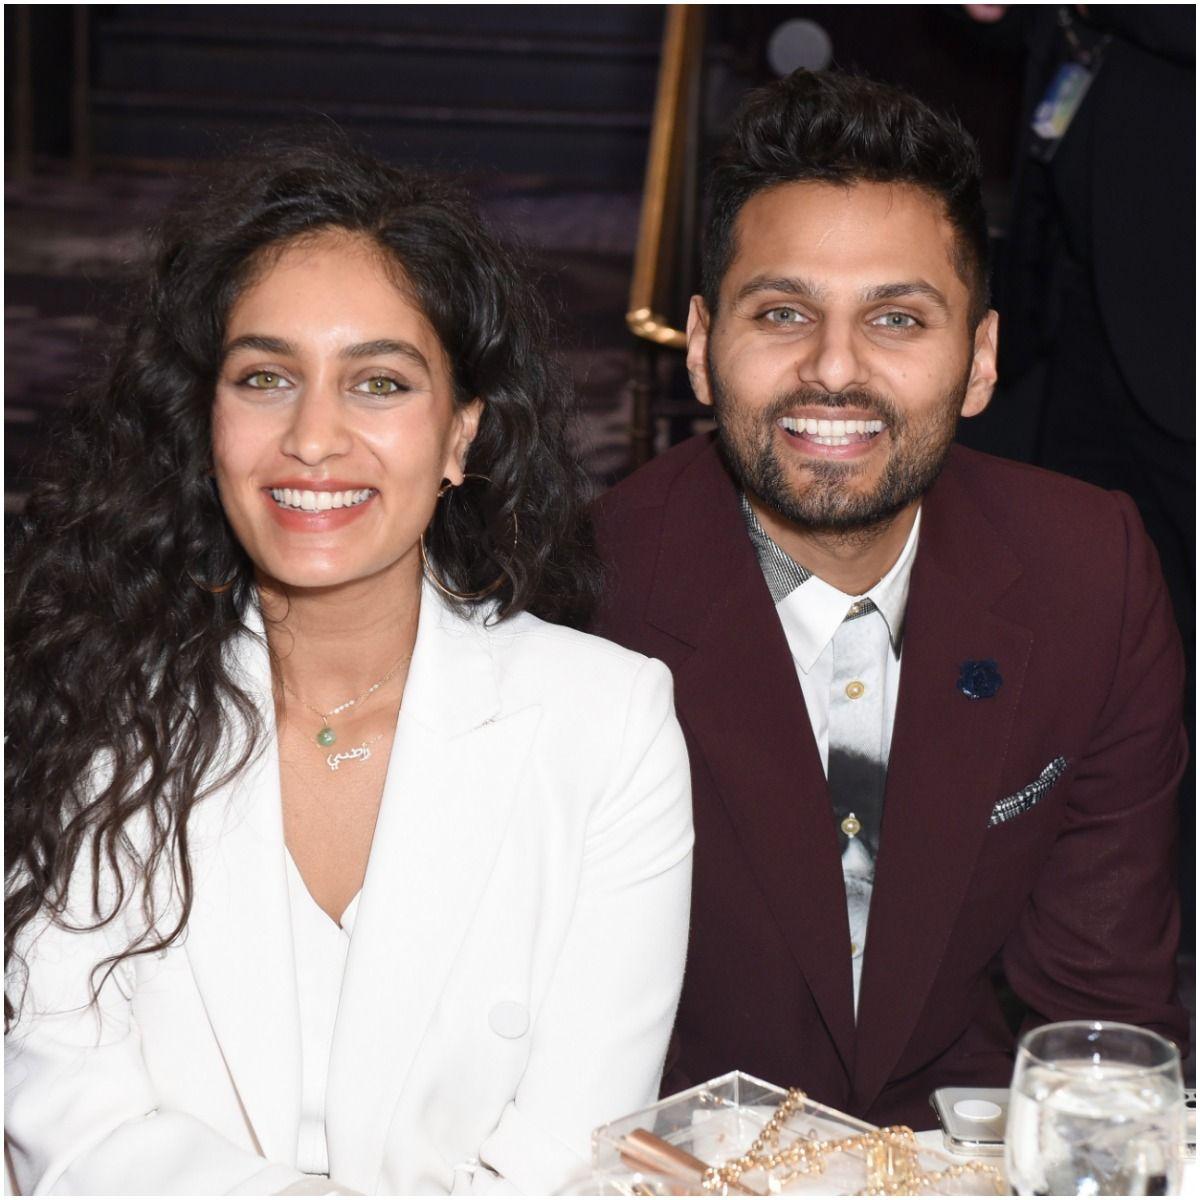 Jay Shetty and his wife Radhi Devlukia